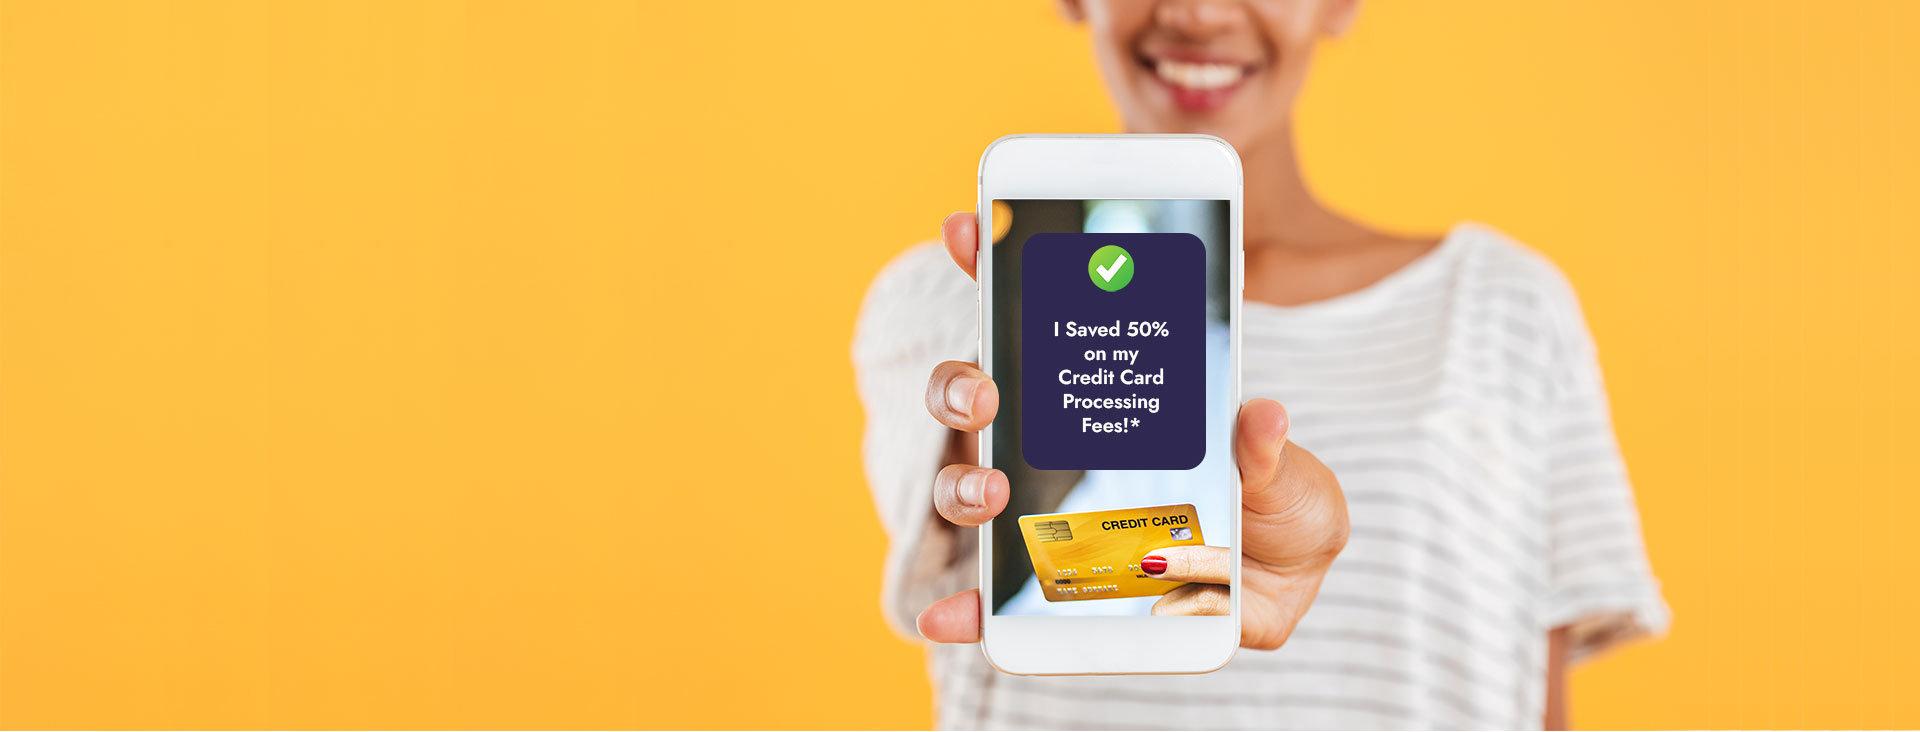 merchant-services-credit-card-processing